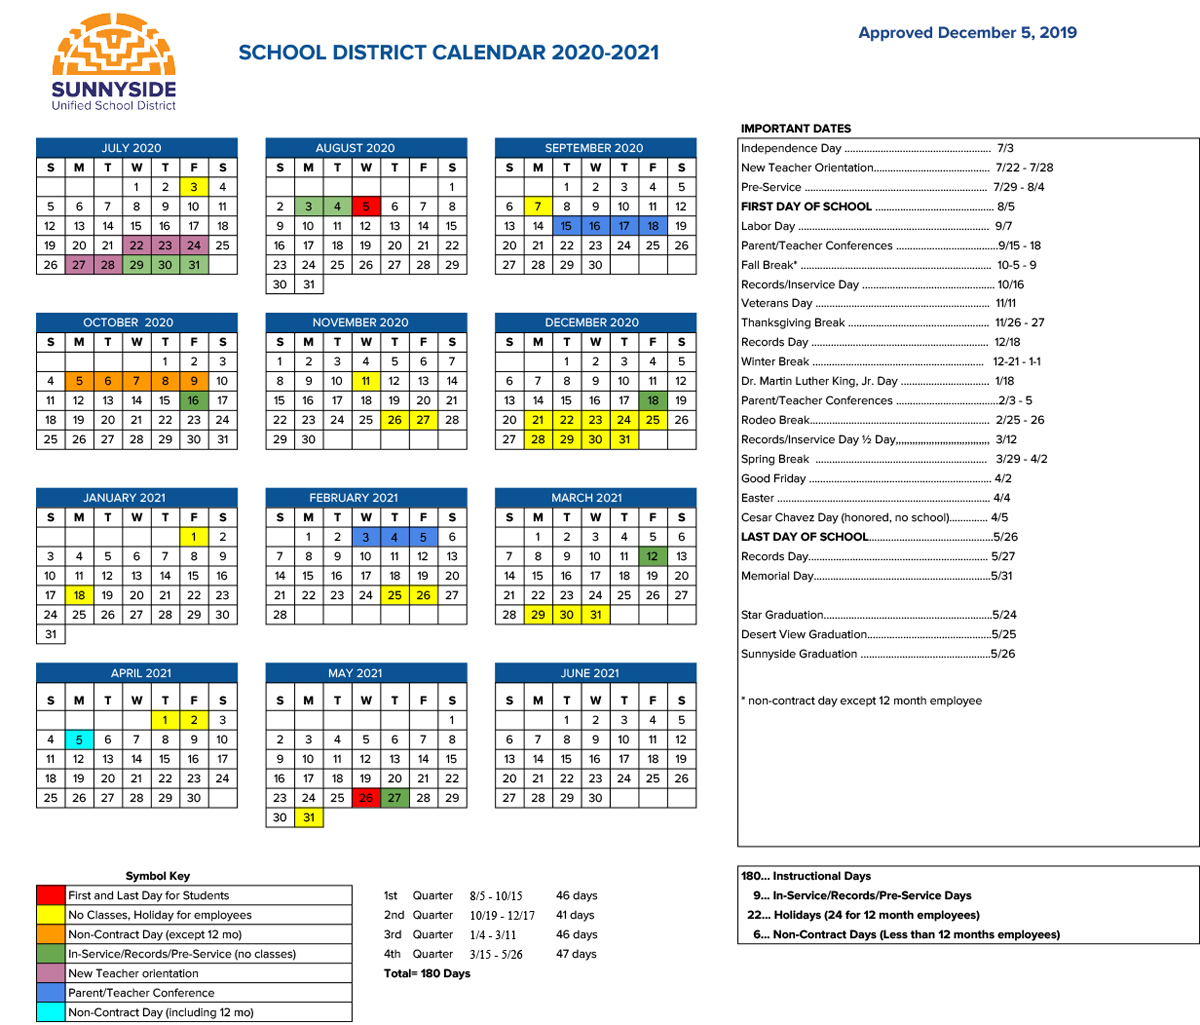 Academic Calendar | Sunnyside Unified School District Throughout Corona School District Calendar 2021 2020